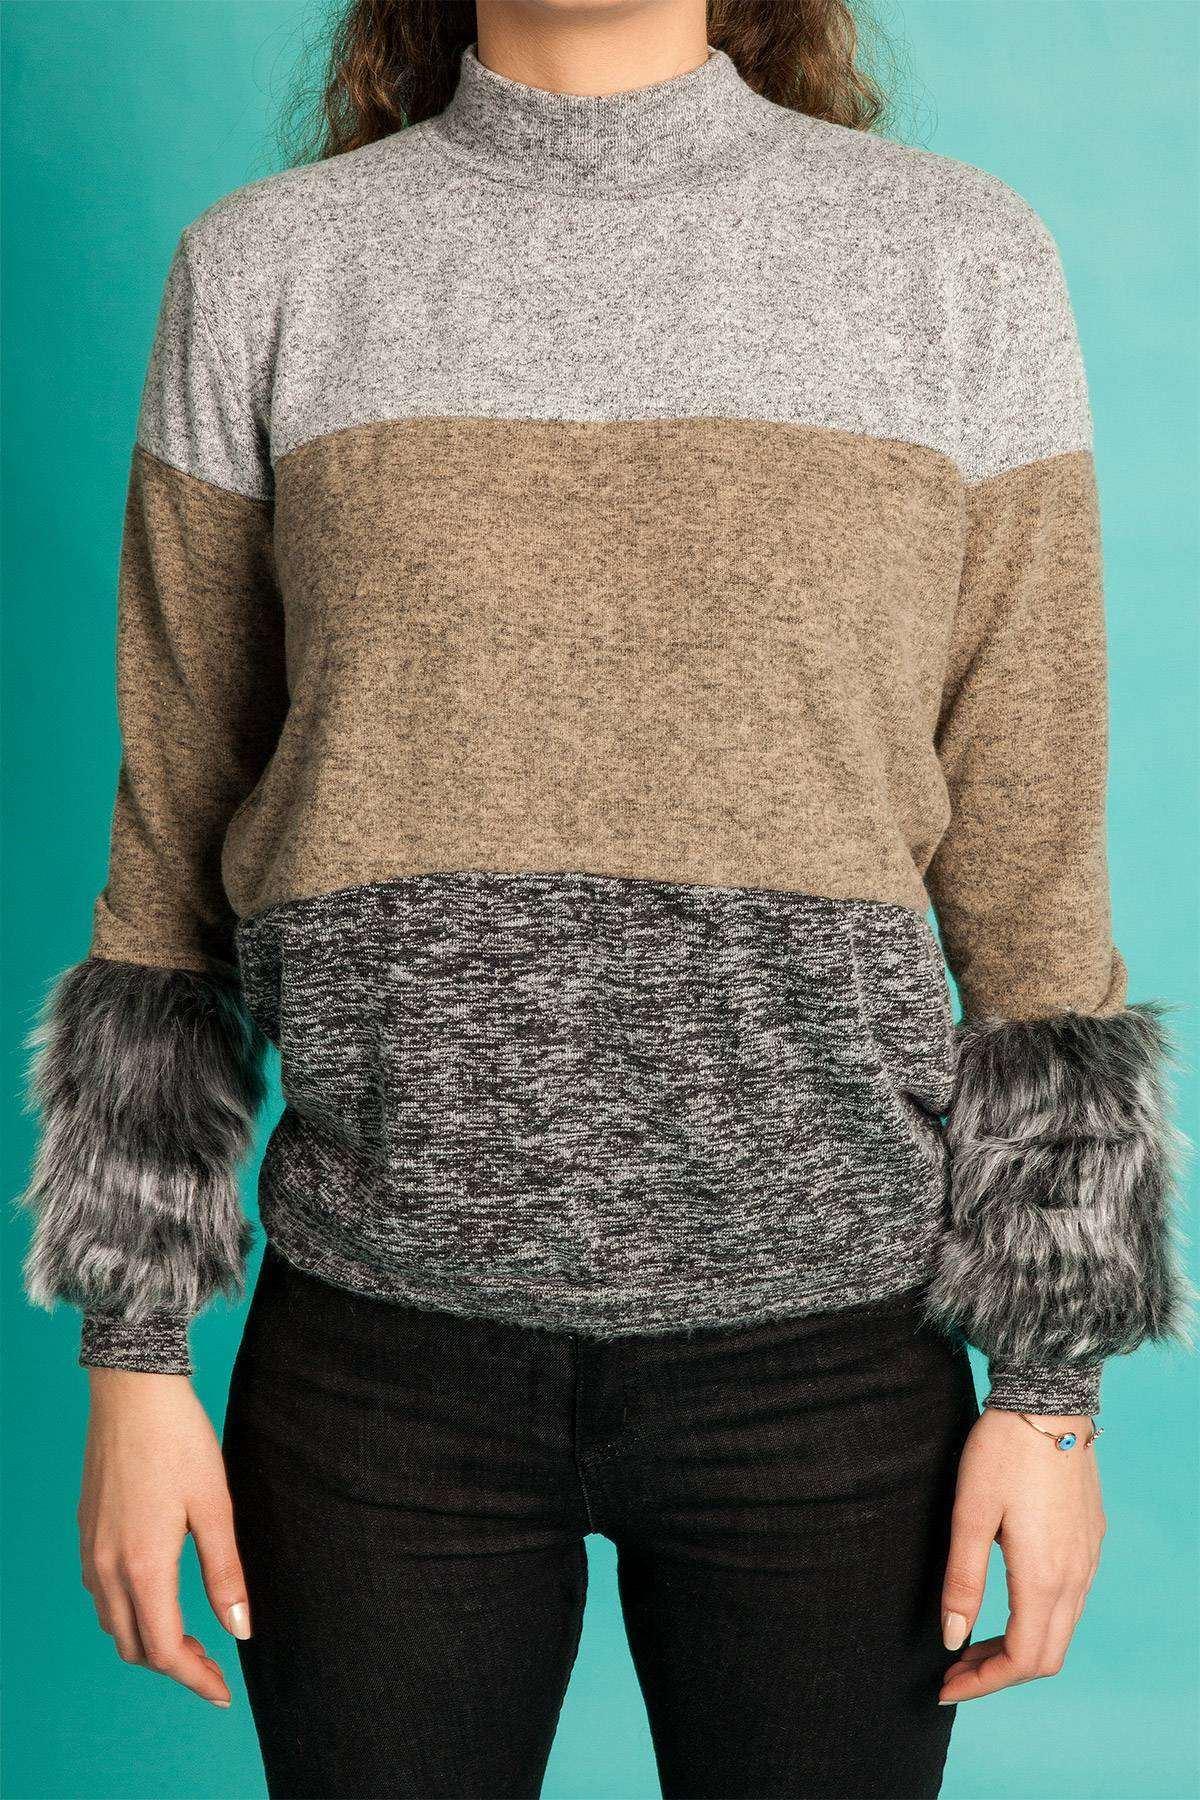 Üç Renkli Kol Ucu Peluş Detaylı Sweatshirt Gri-Kahve